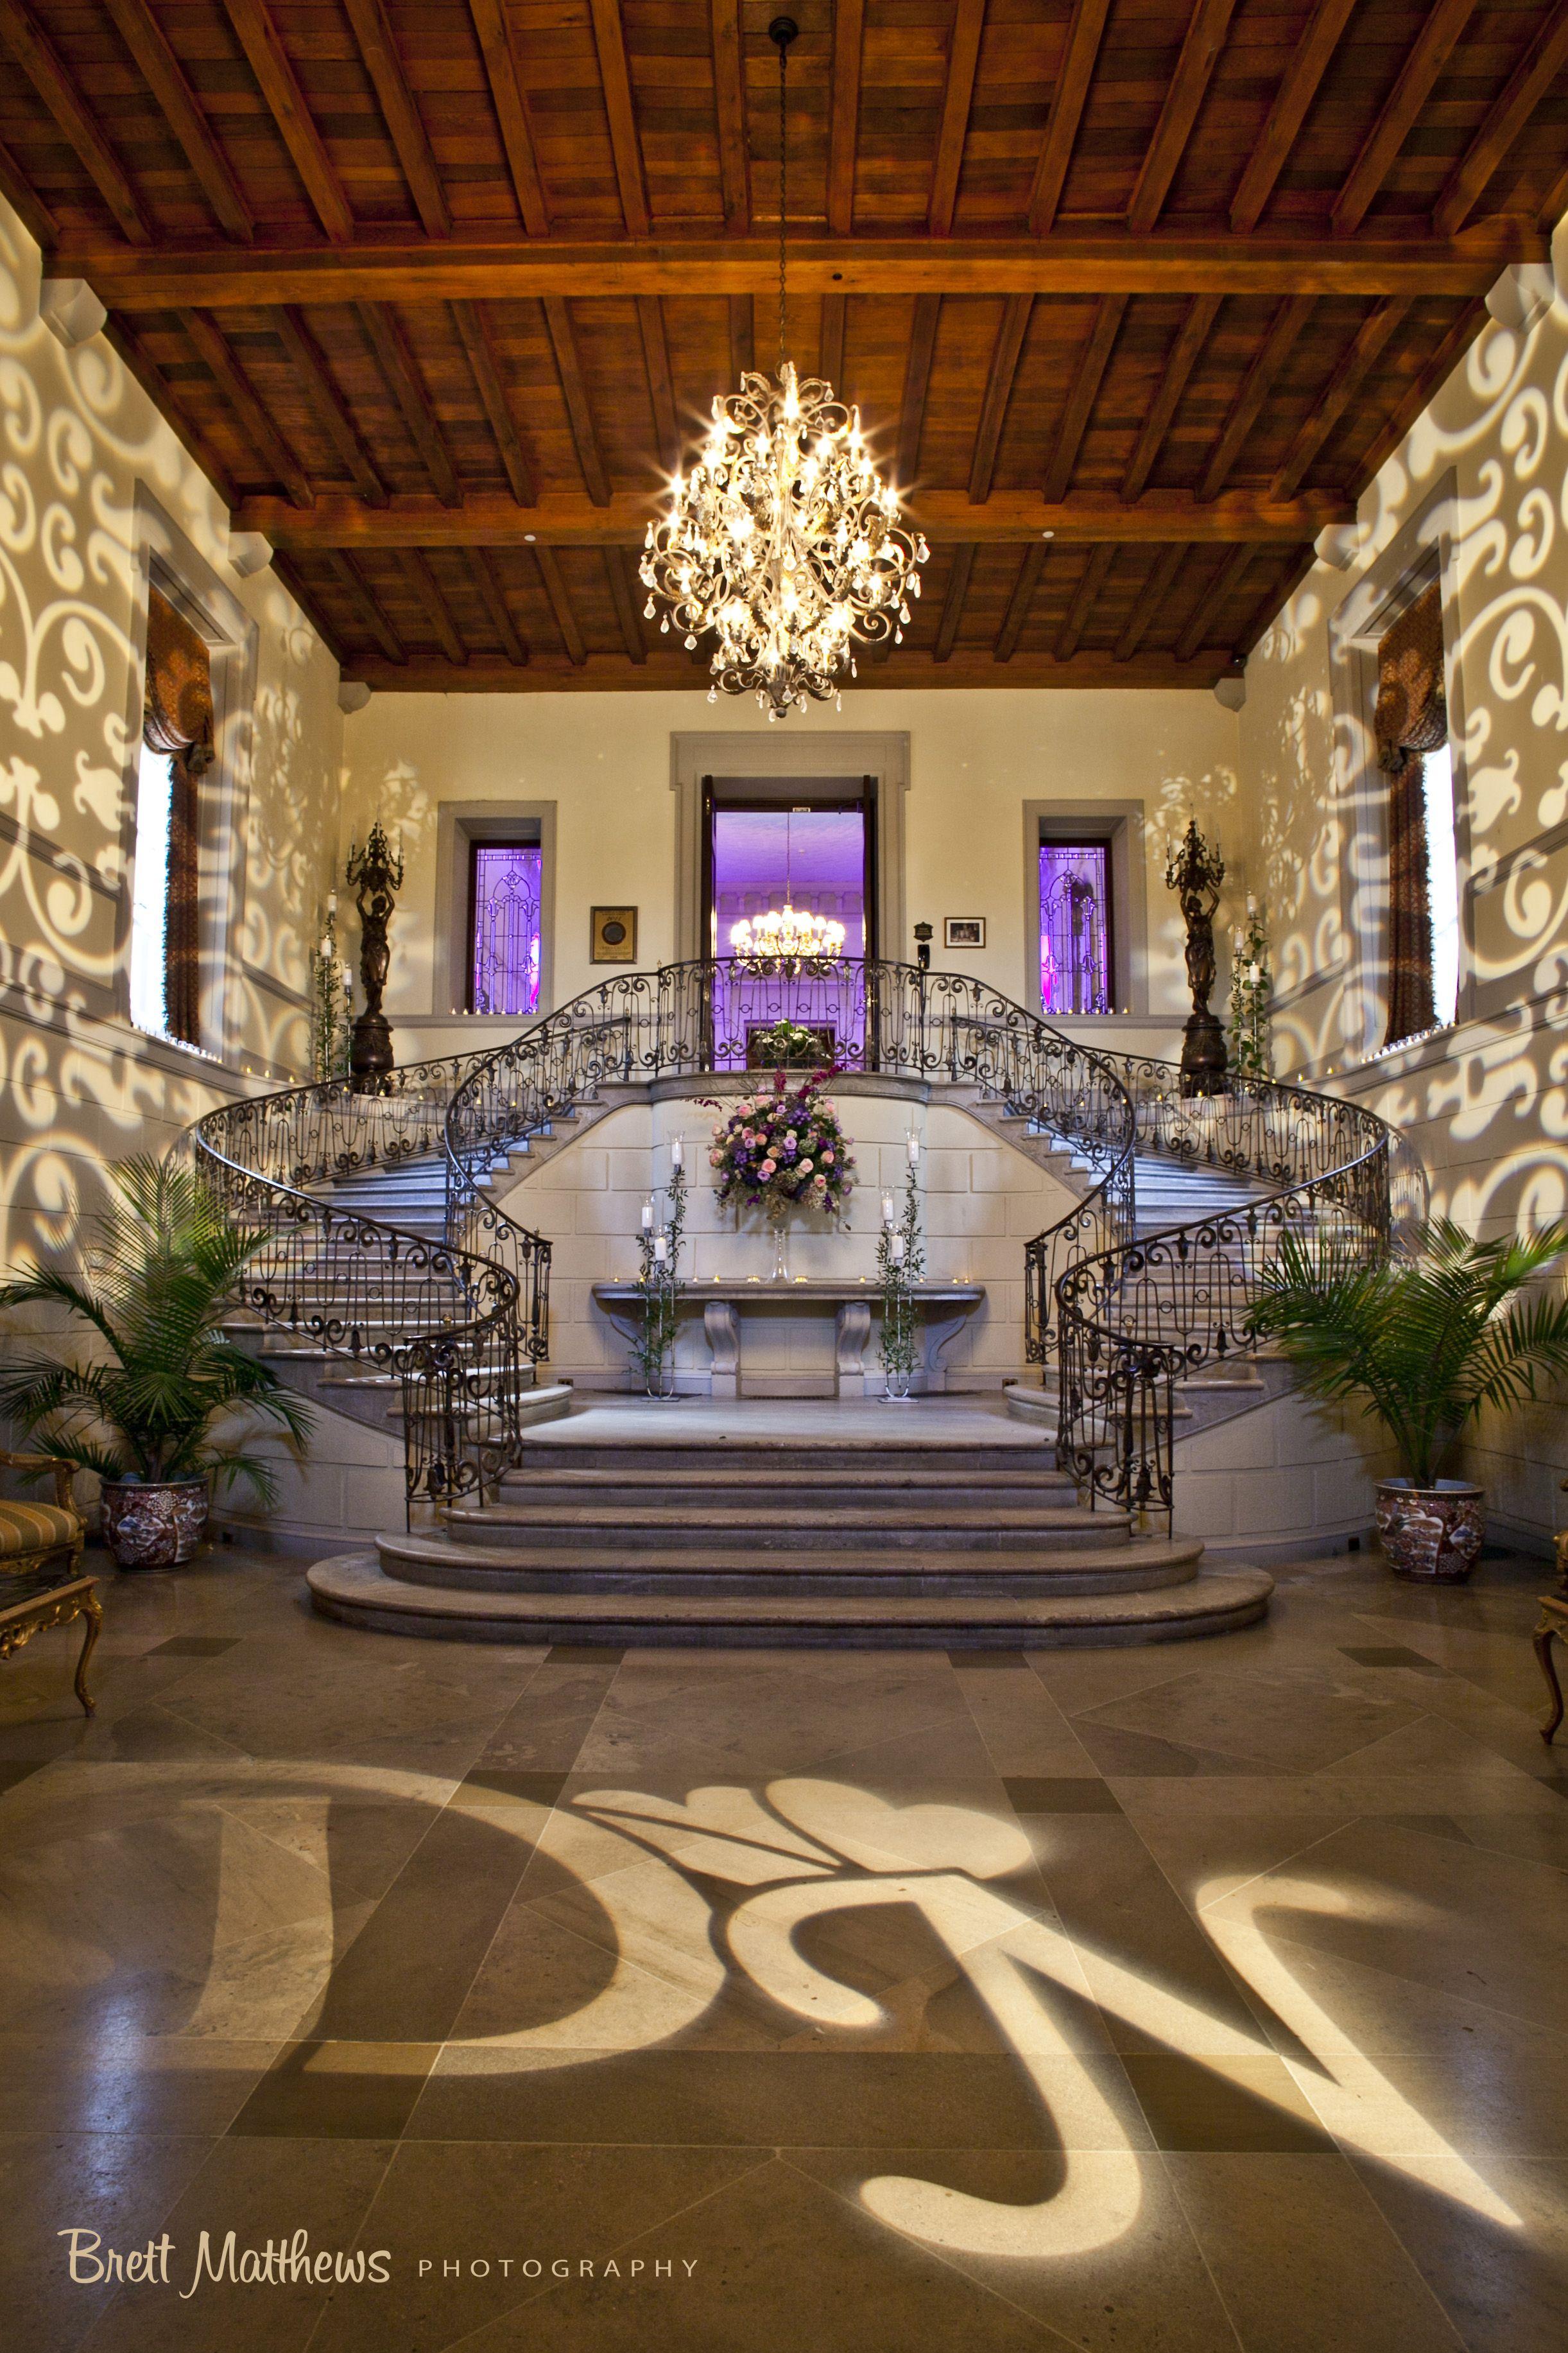 Foyer Decor For Wedding : Entry foyer grand staircase brett matthews photography